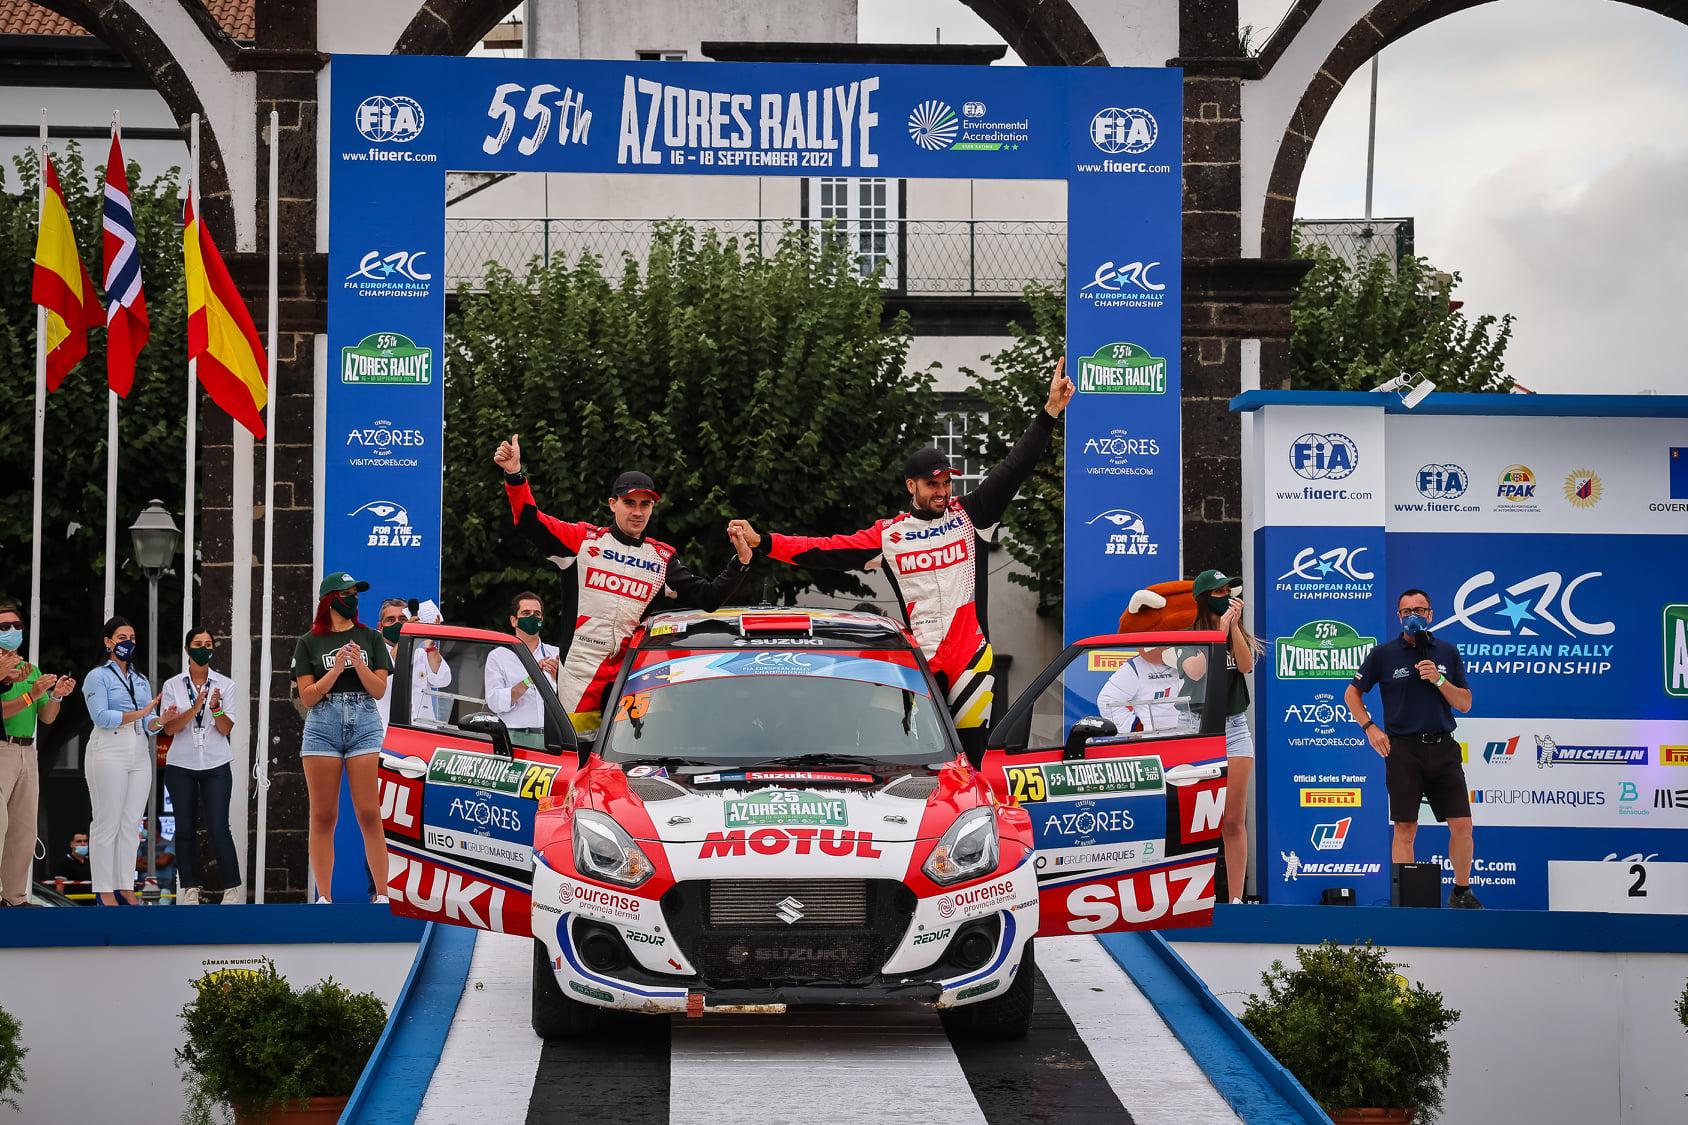 ERC: 55º Azores Rallye [16-18 Septiembre] - Página 2 E_pSk-xWQAM2ewG?format=jpg&name=large